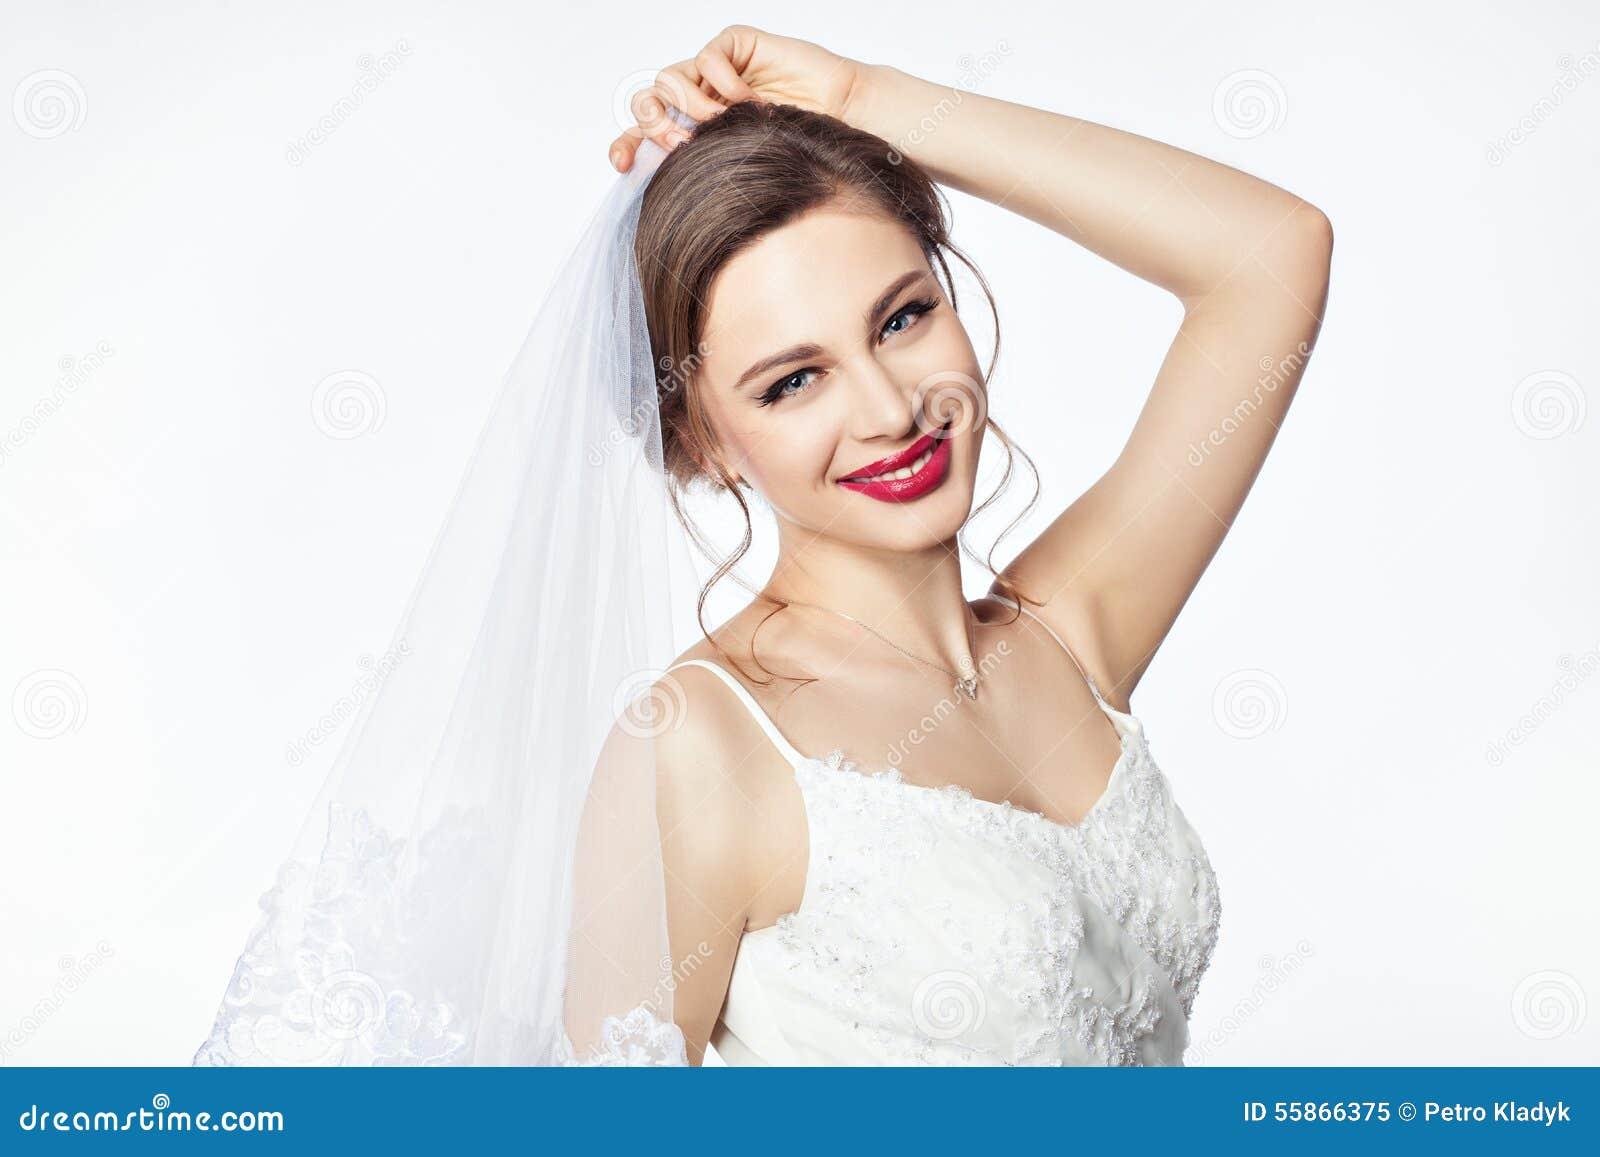 The Bride Head In 31